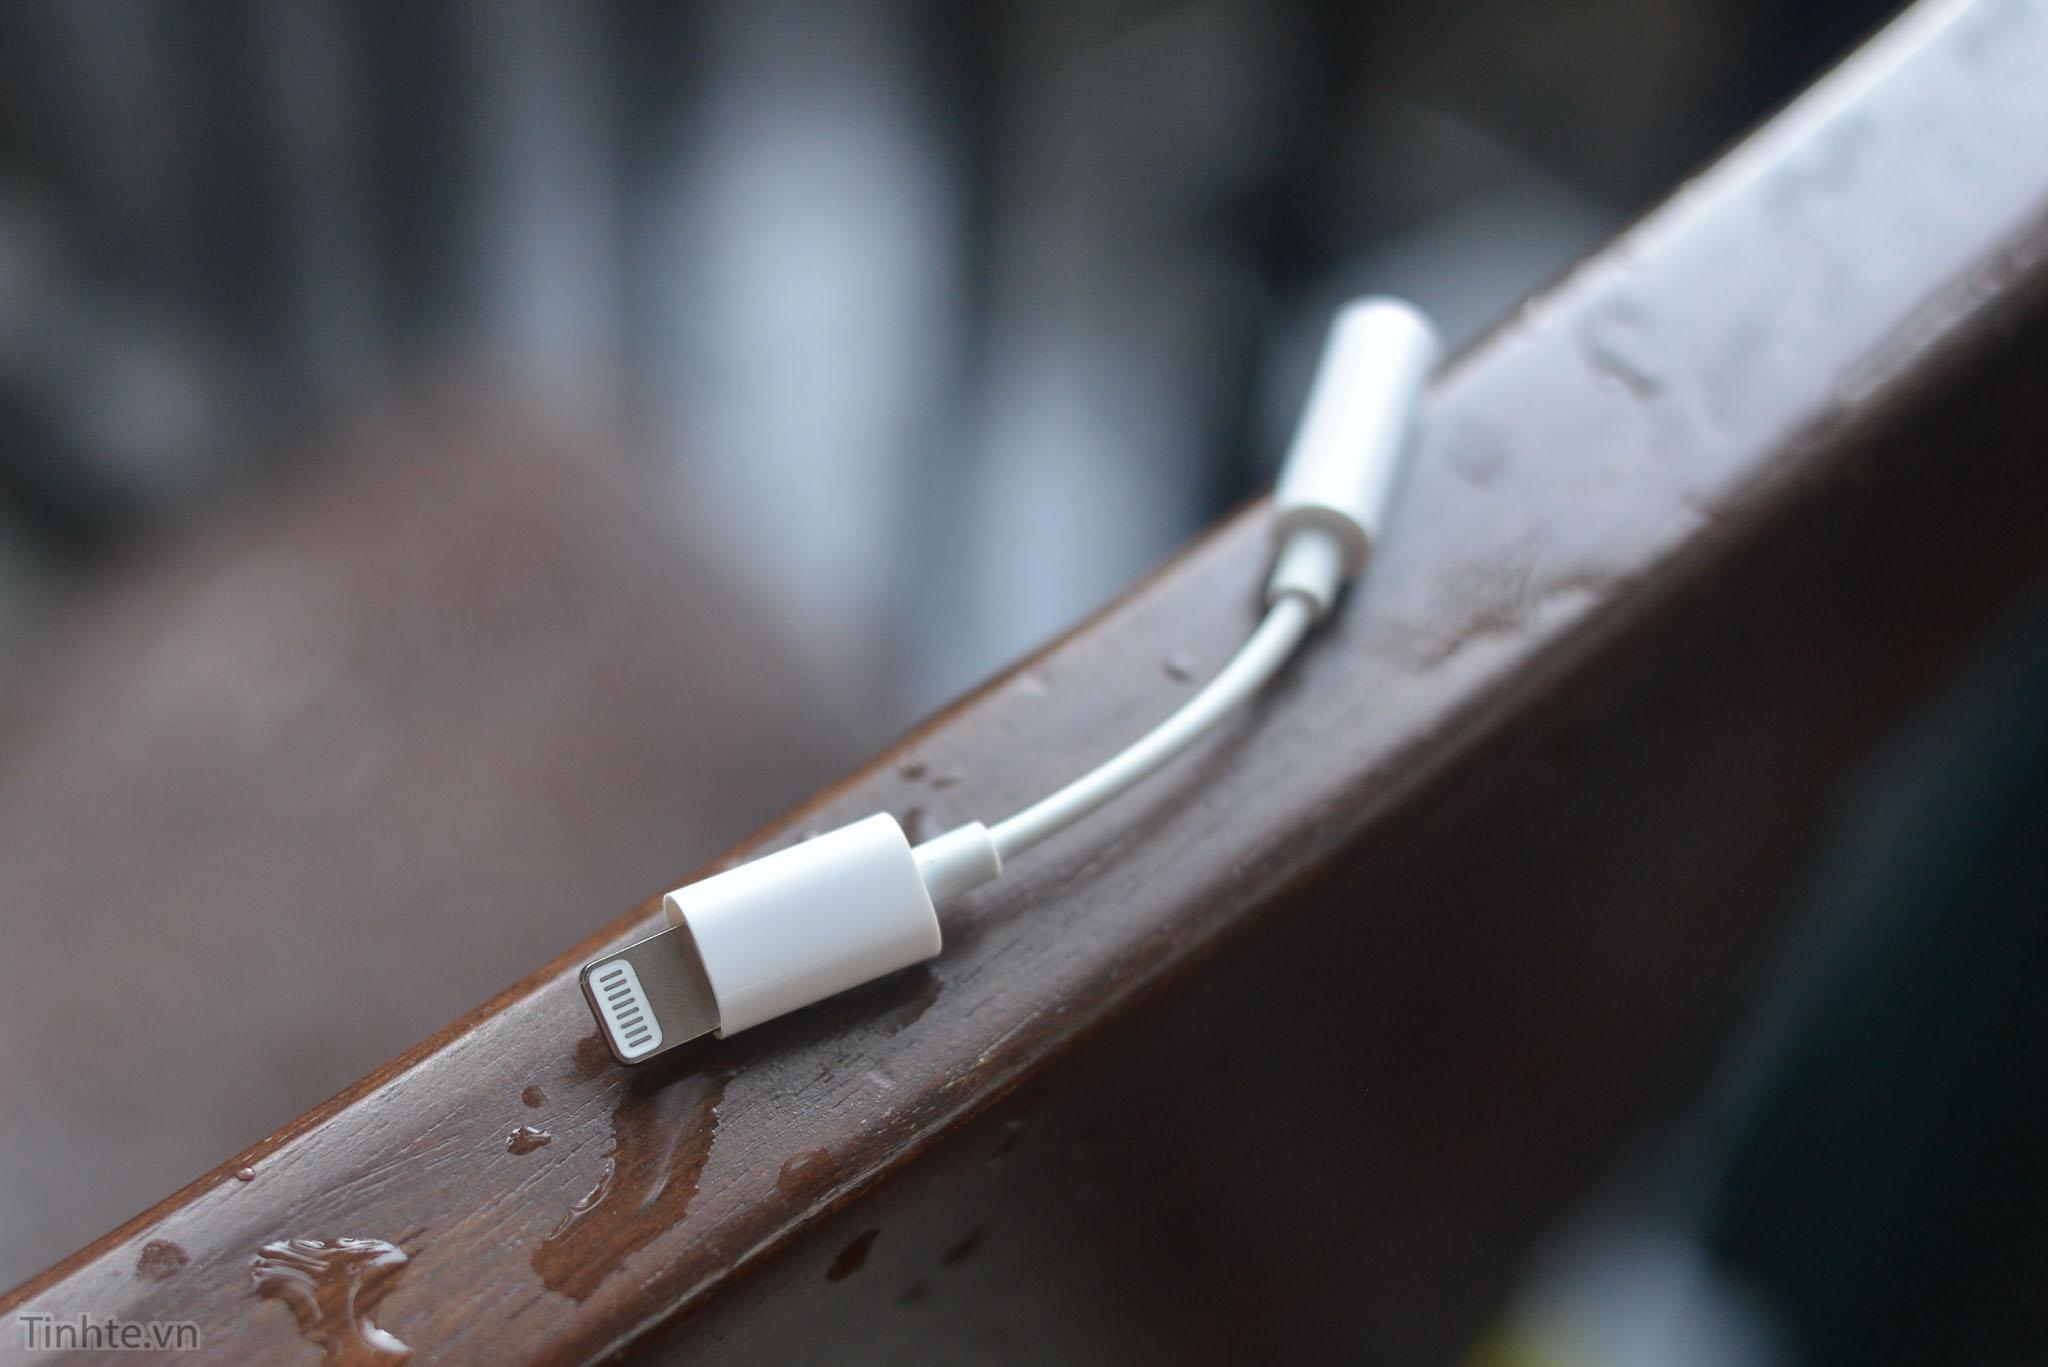 Suposto adaptador de Lightning para 3,5mm